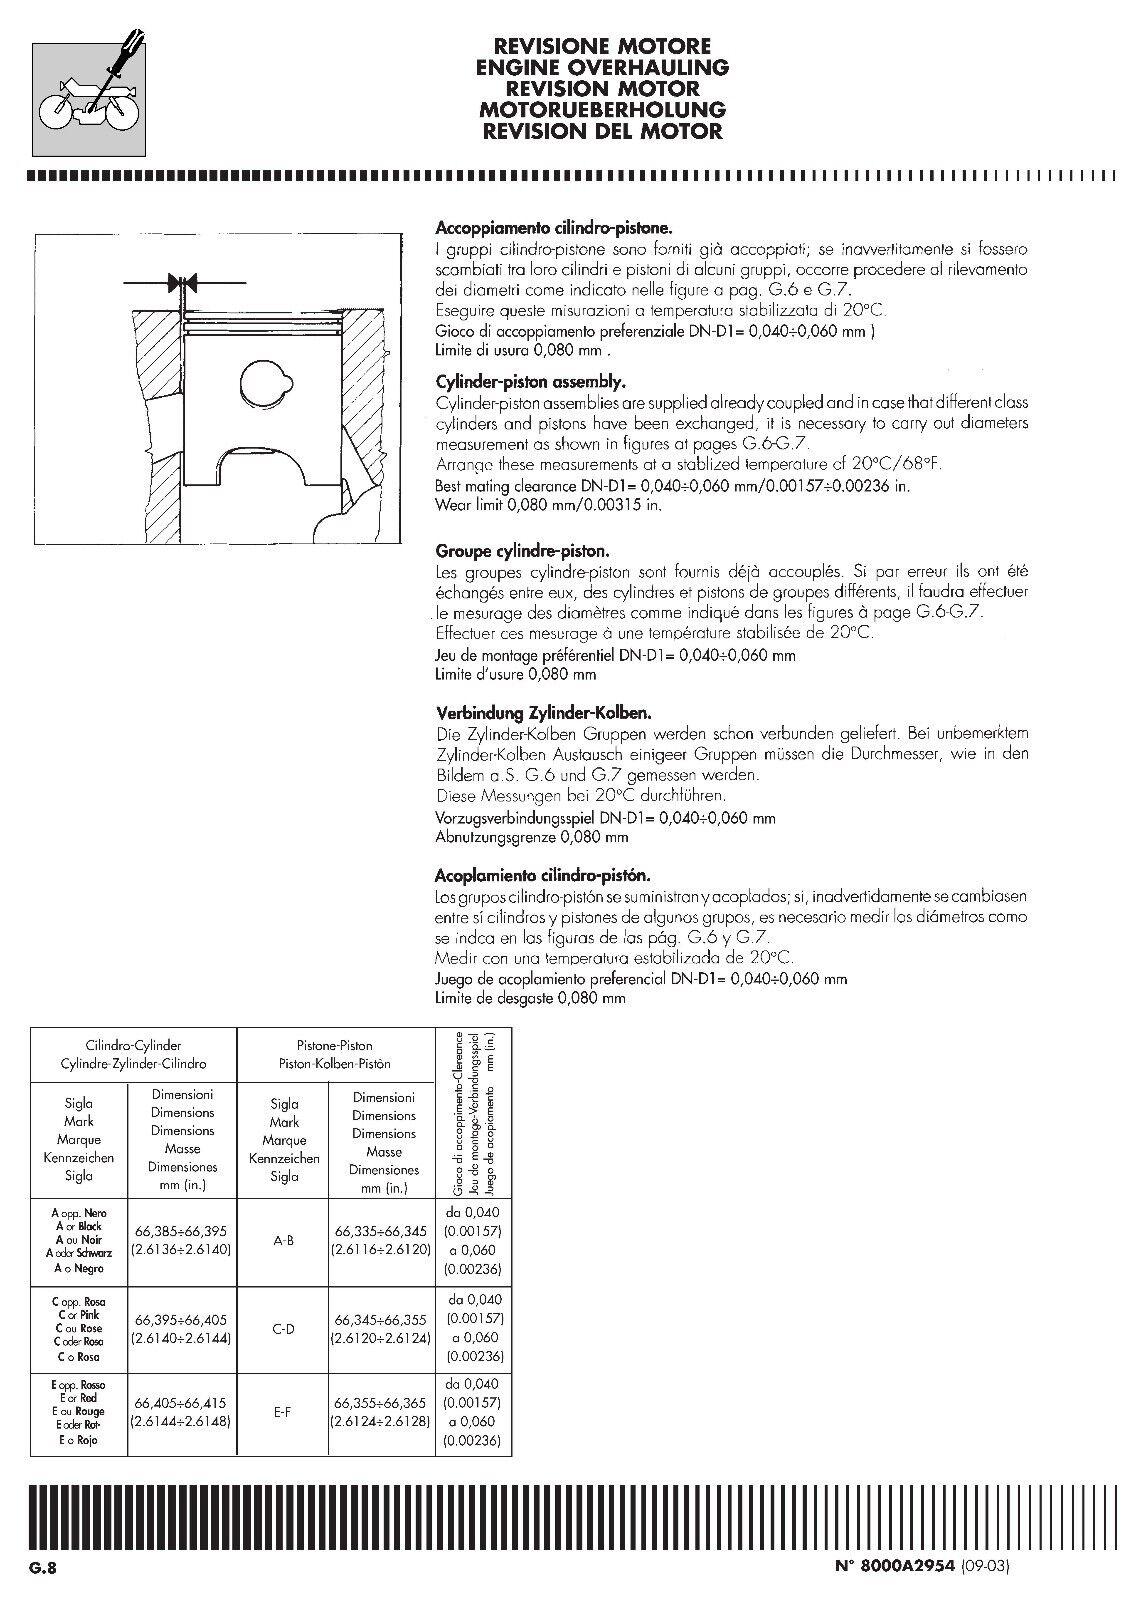 ... Husqvarna workshop service manual 2004 WR 250 & CR 250 5 of 12 ...